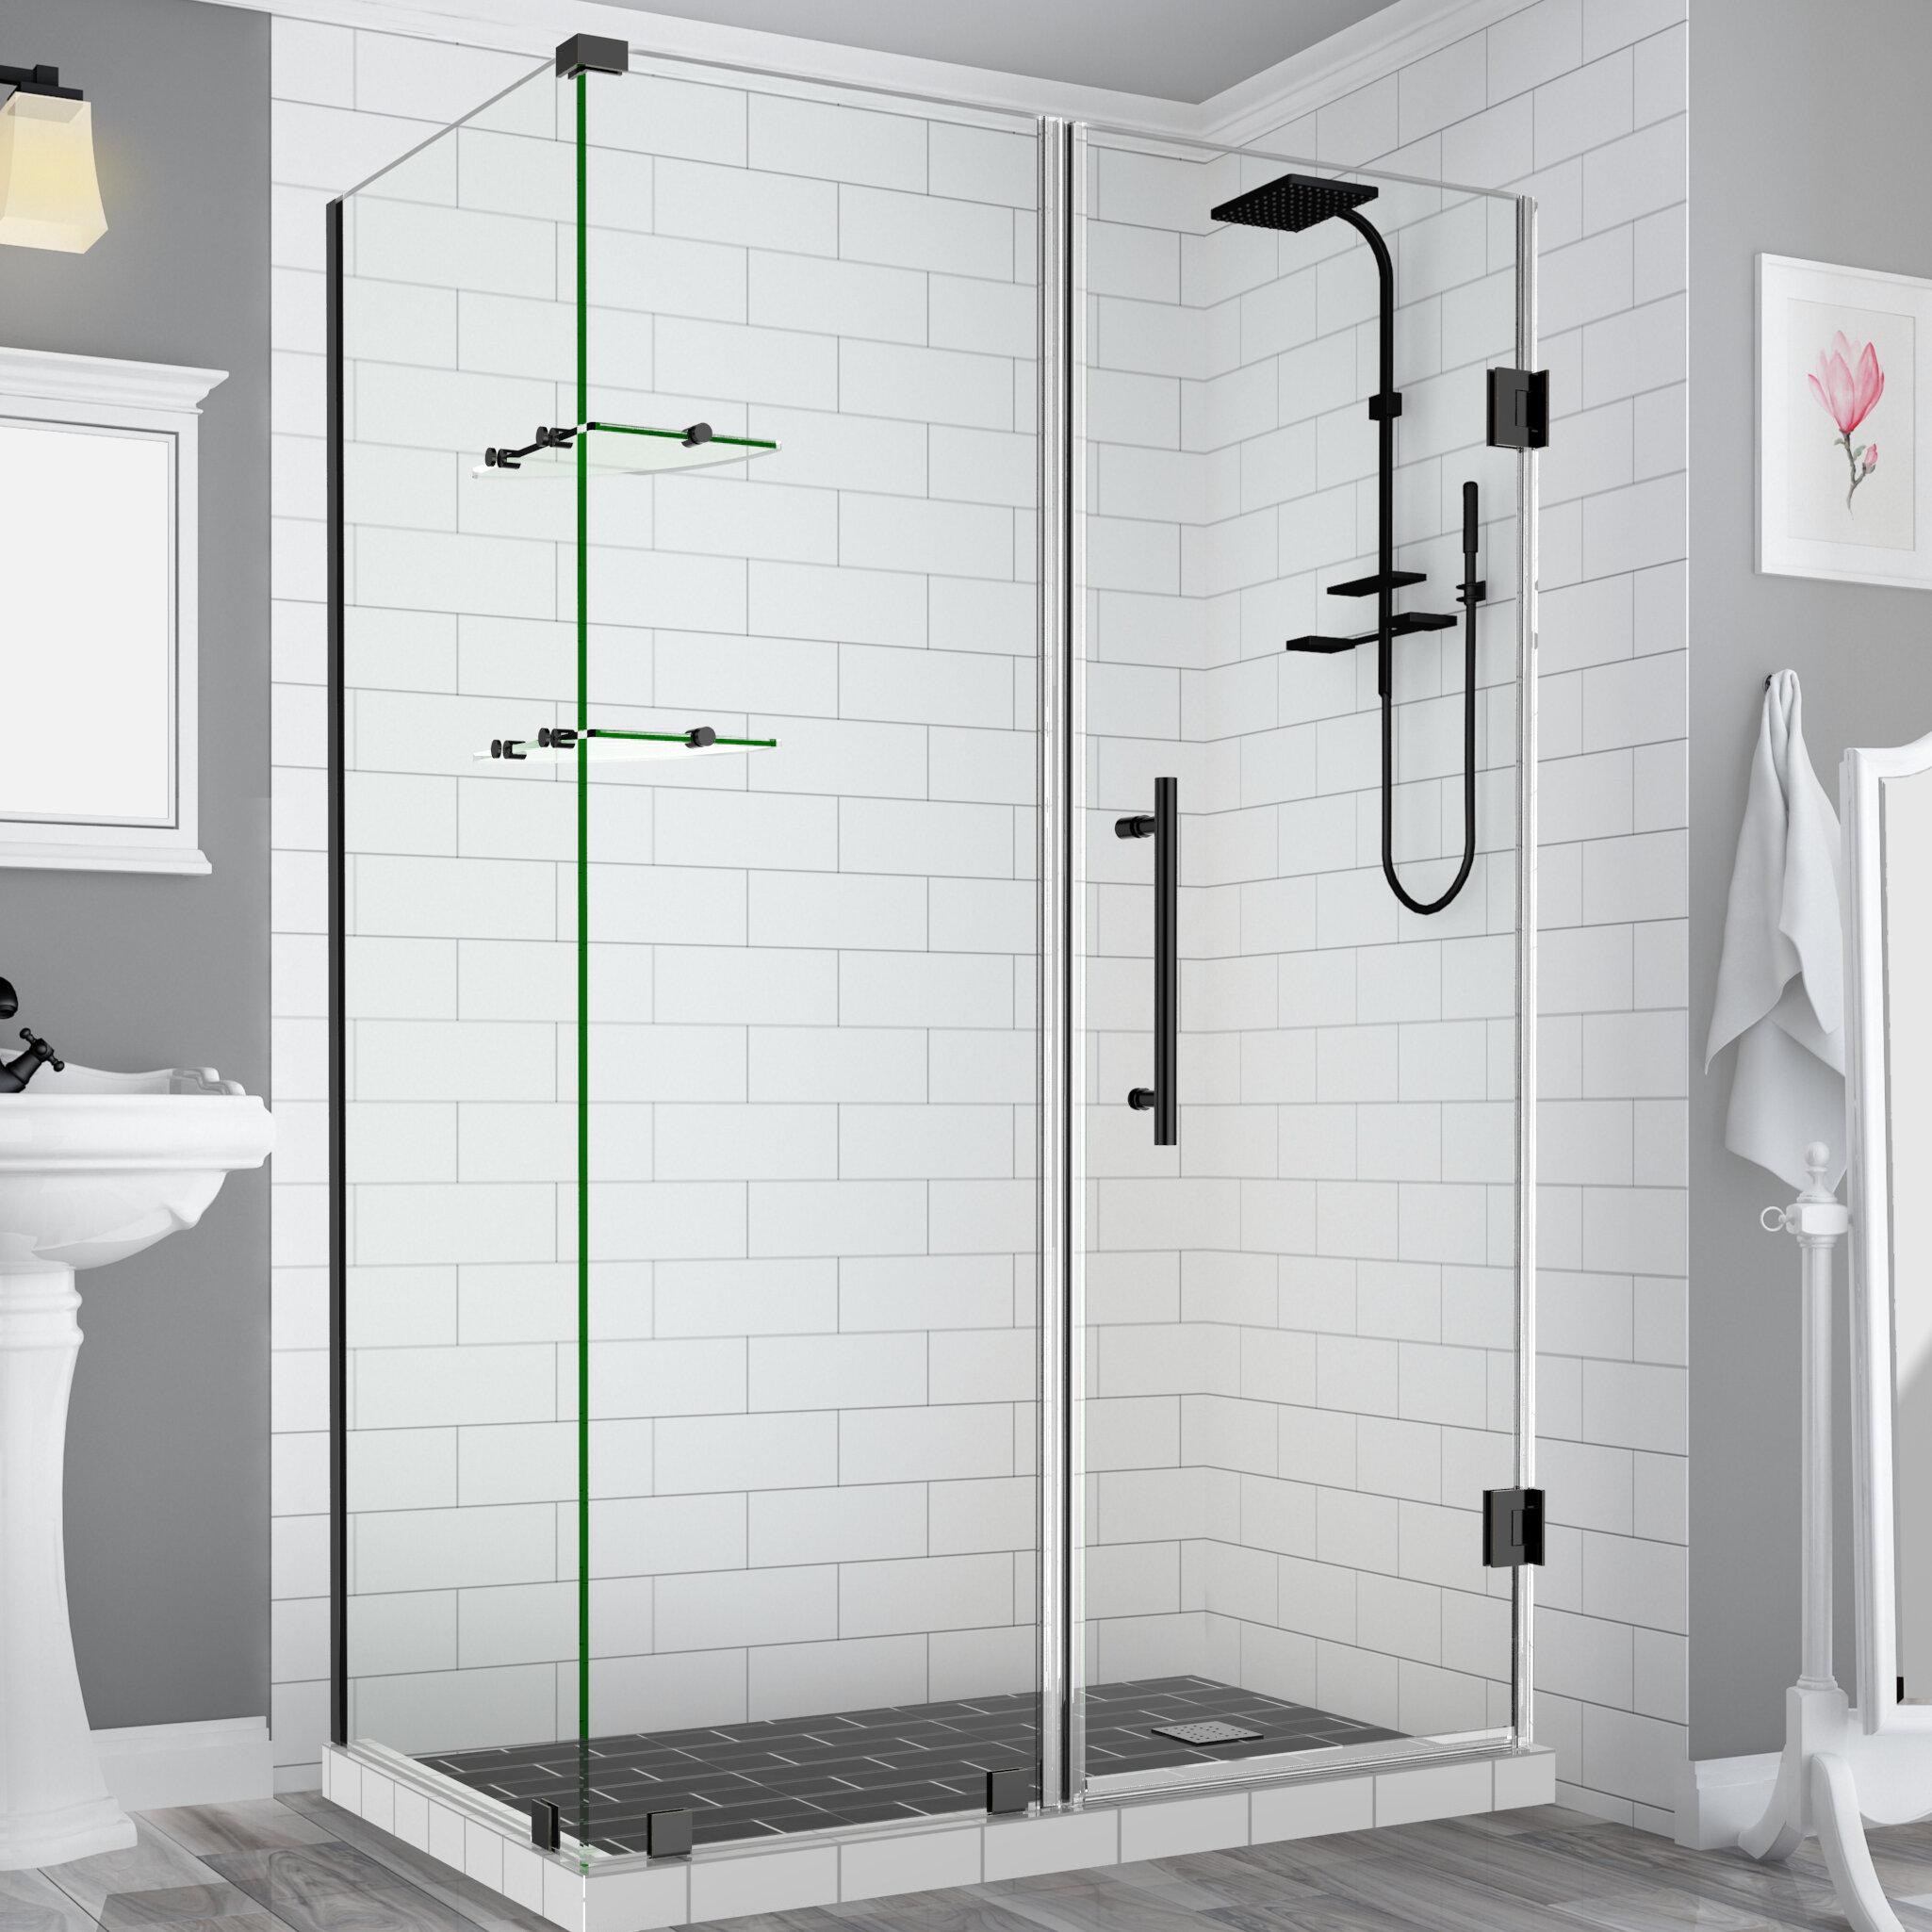 Aston Bromley Gs Frameless 72 X 72 Rectangle Hinged Shower Enclosure Wayfair